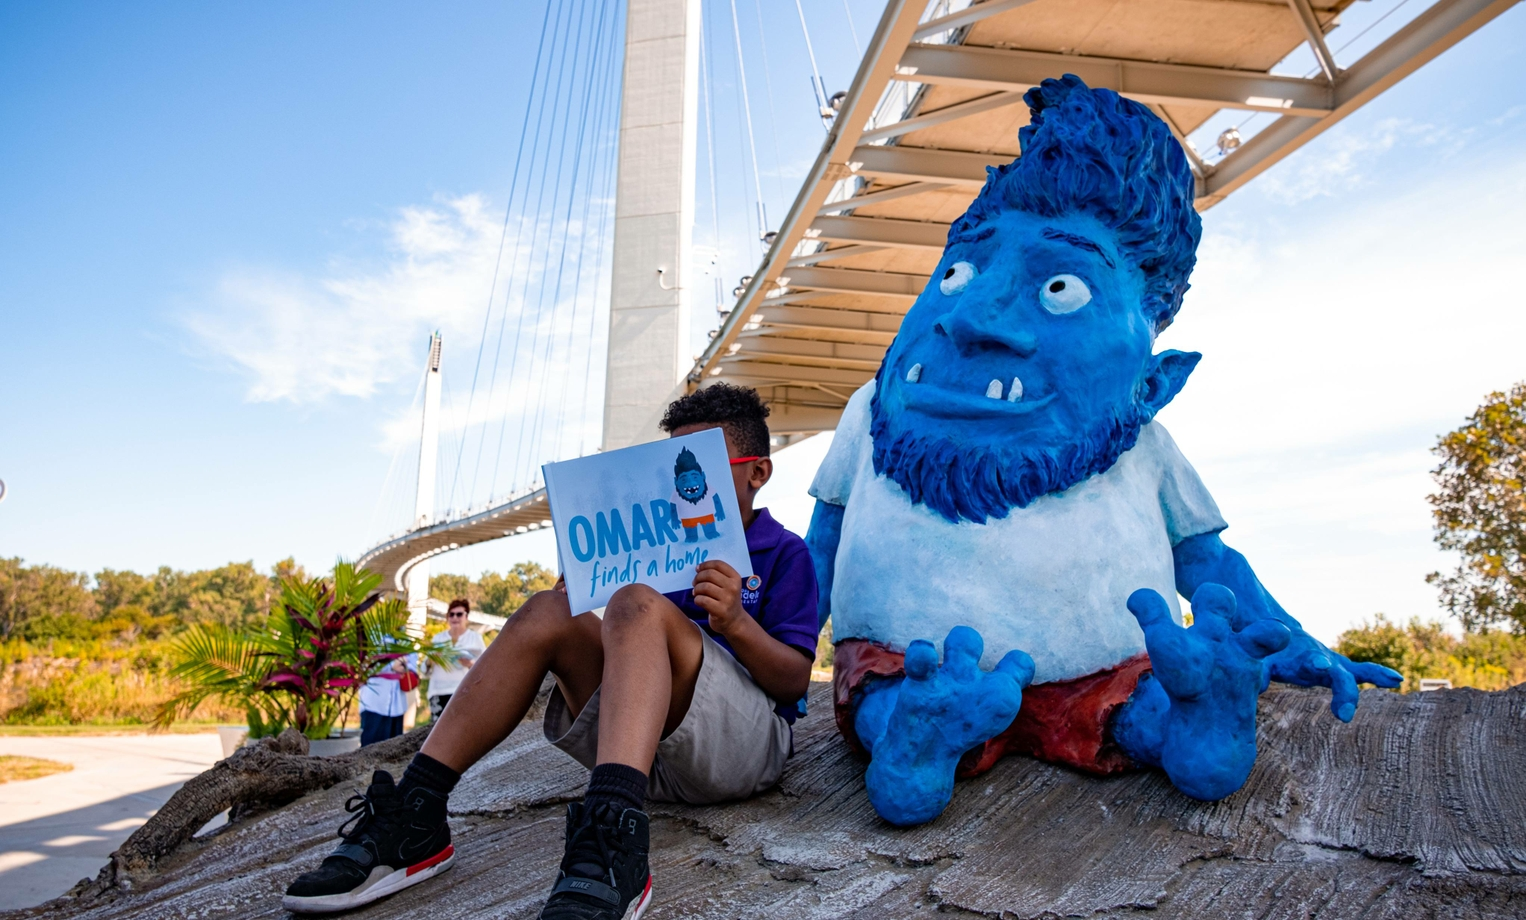 Visit Omaha's OMAR the Troll Wins Big